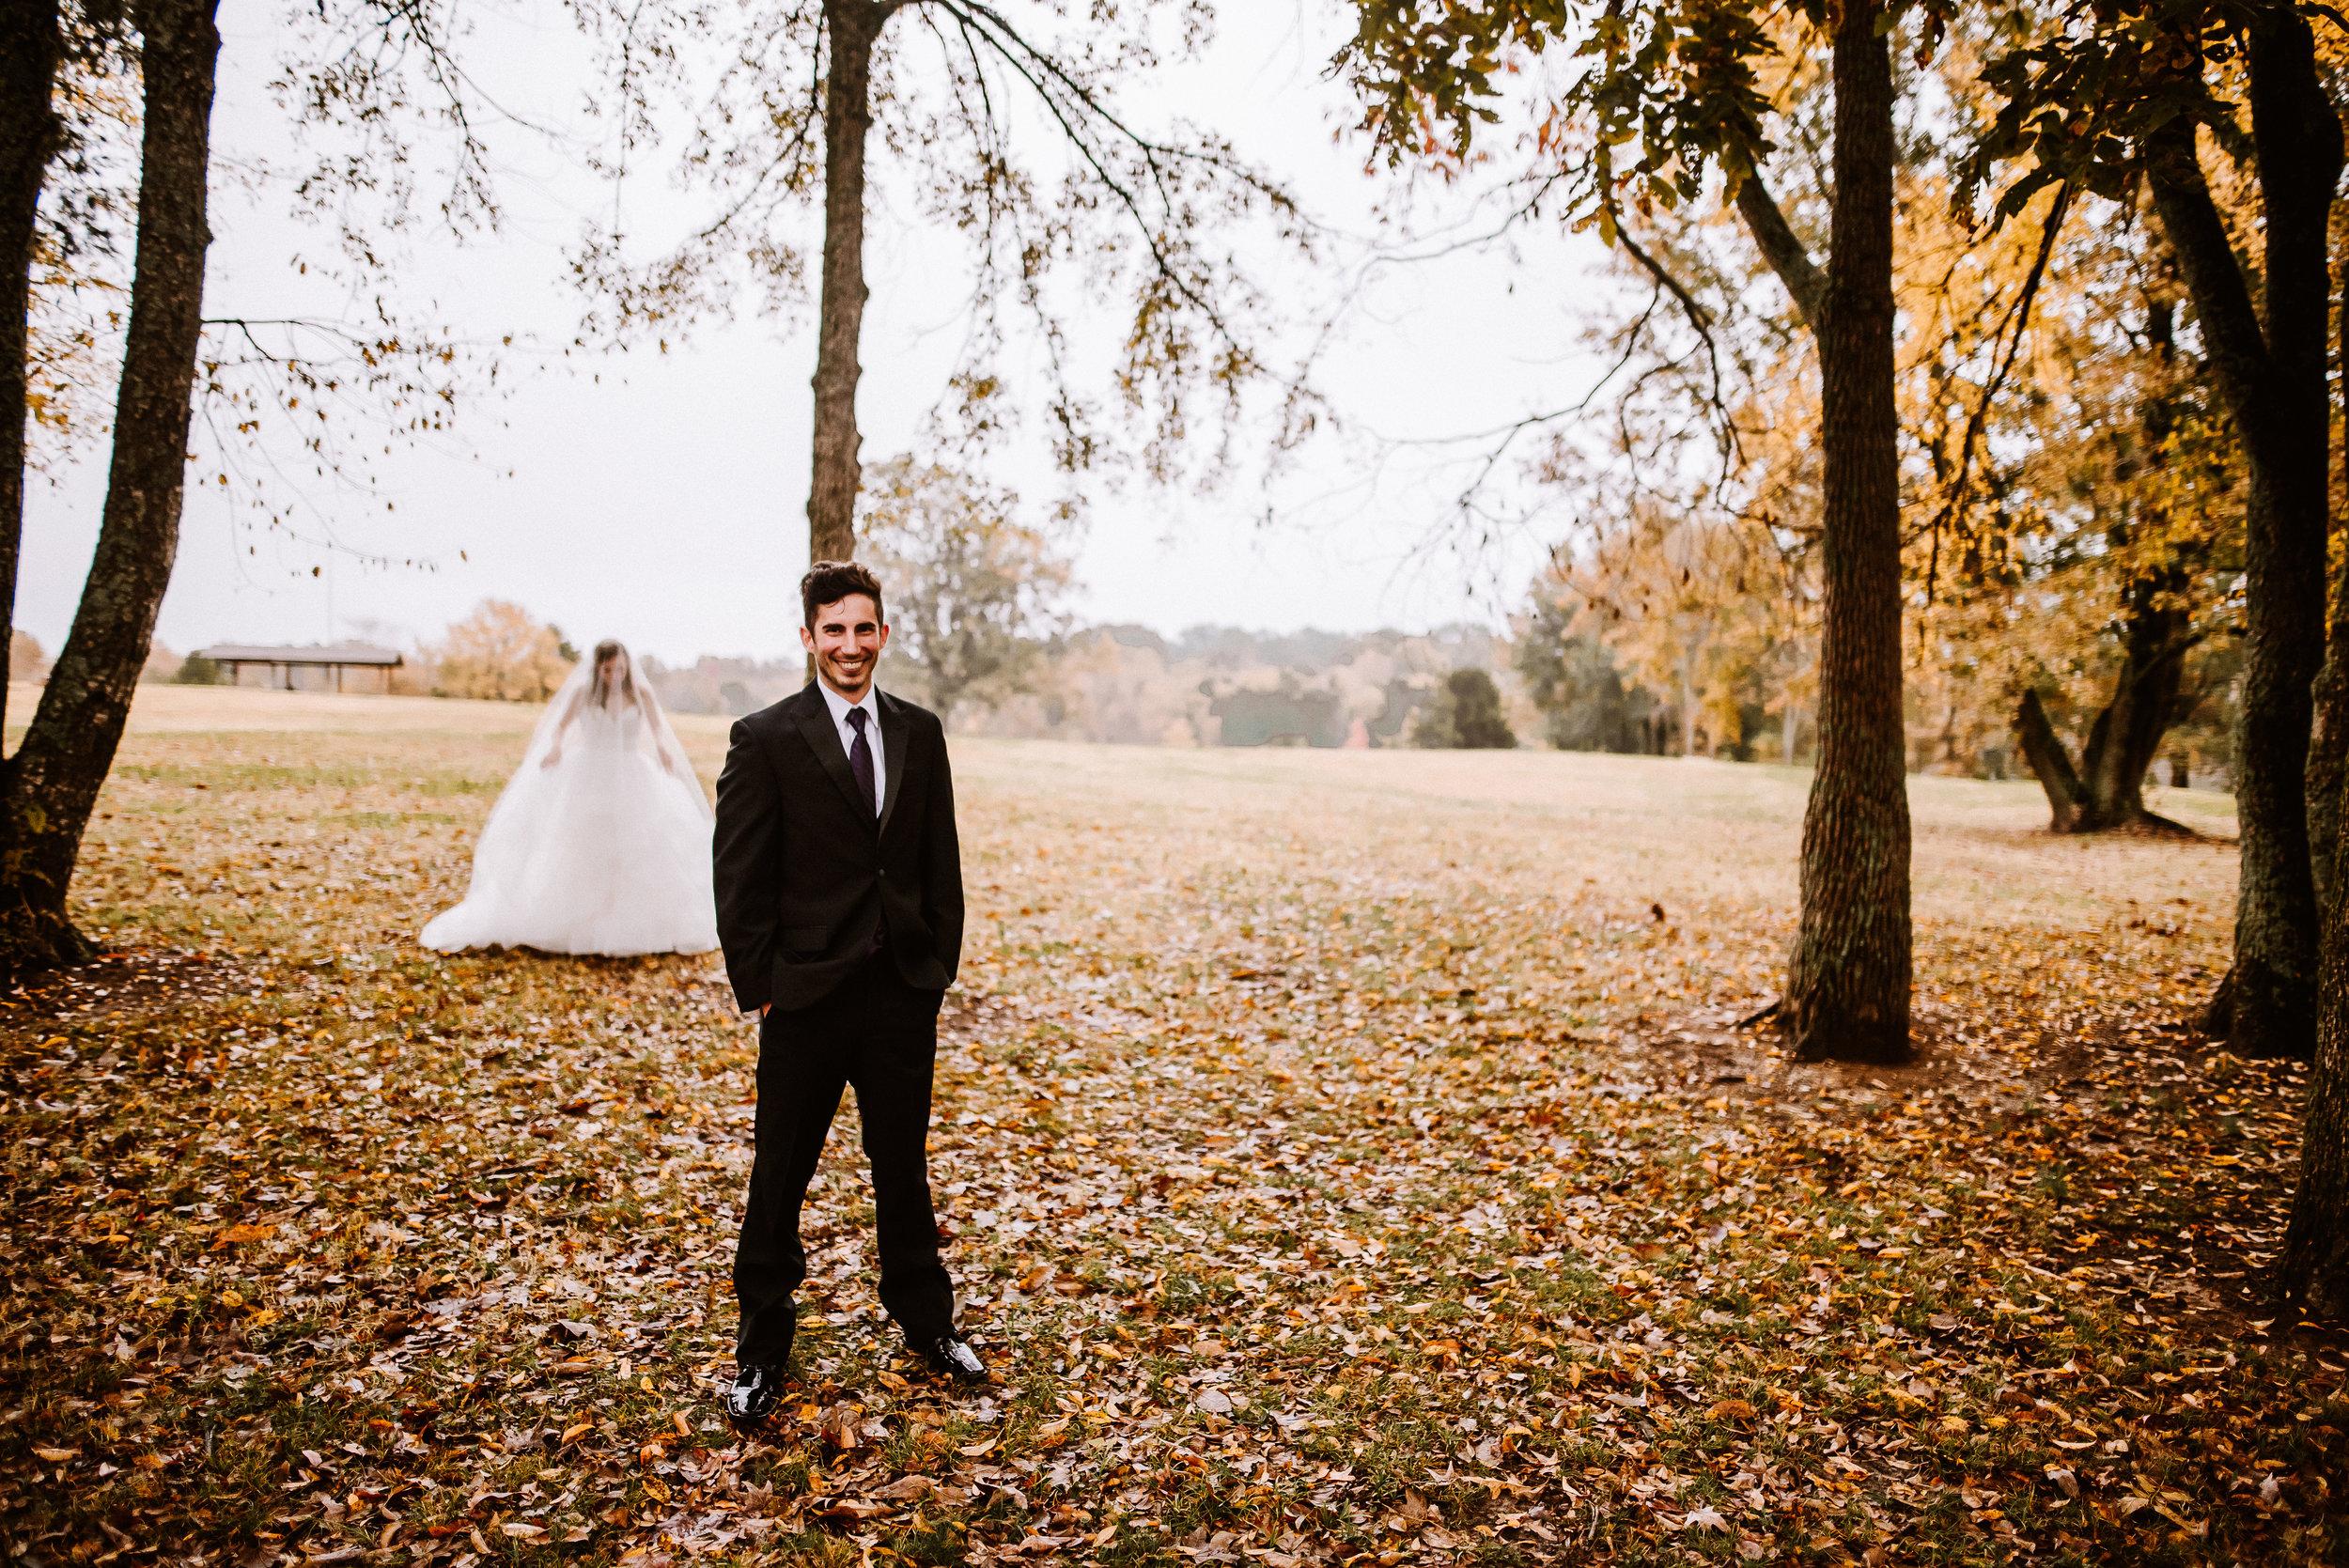 Lucchesi-Wedding_Shelby-Farms_Ashley-Benham-Photography-109.jpg